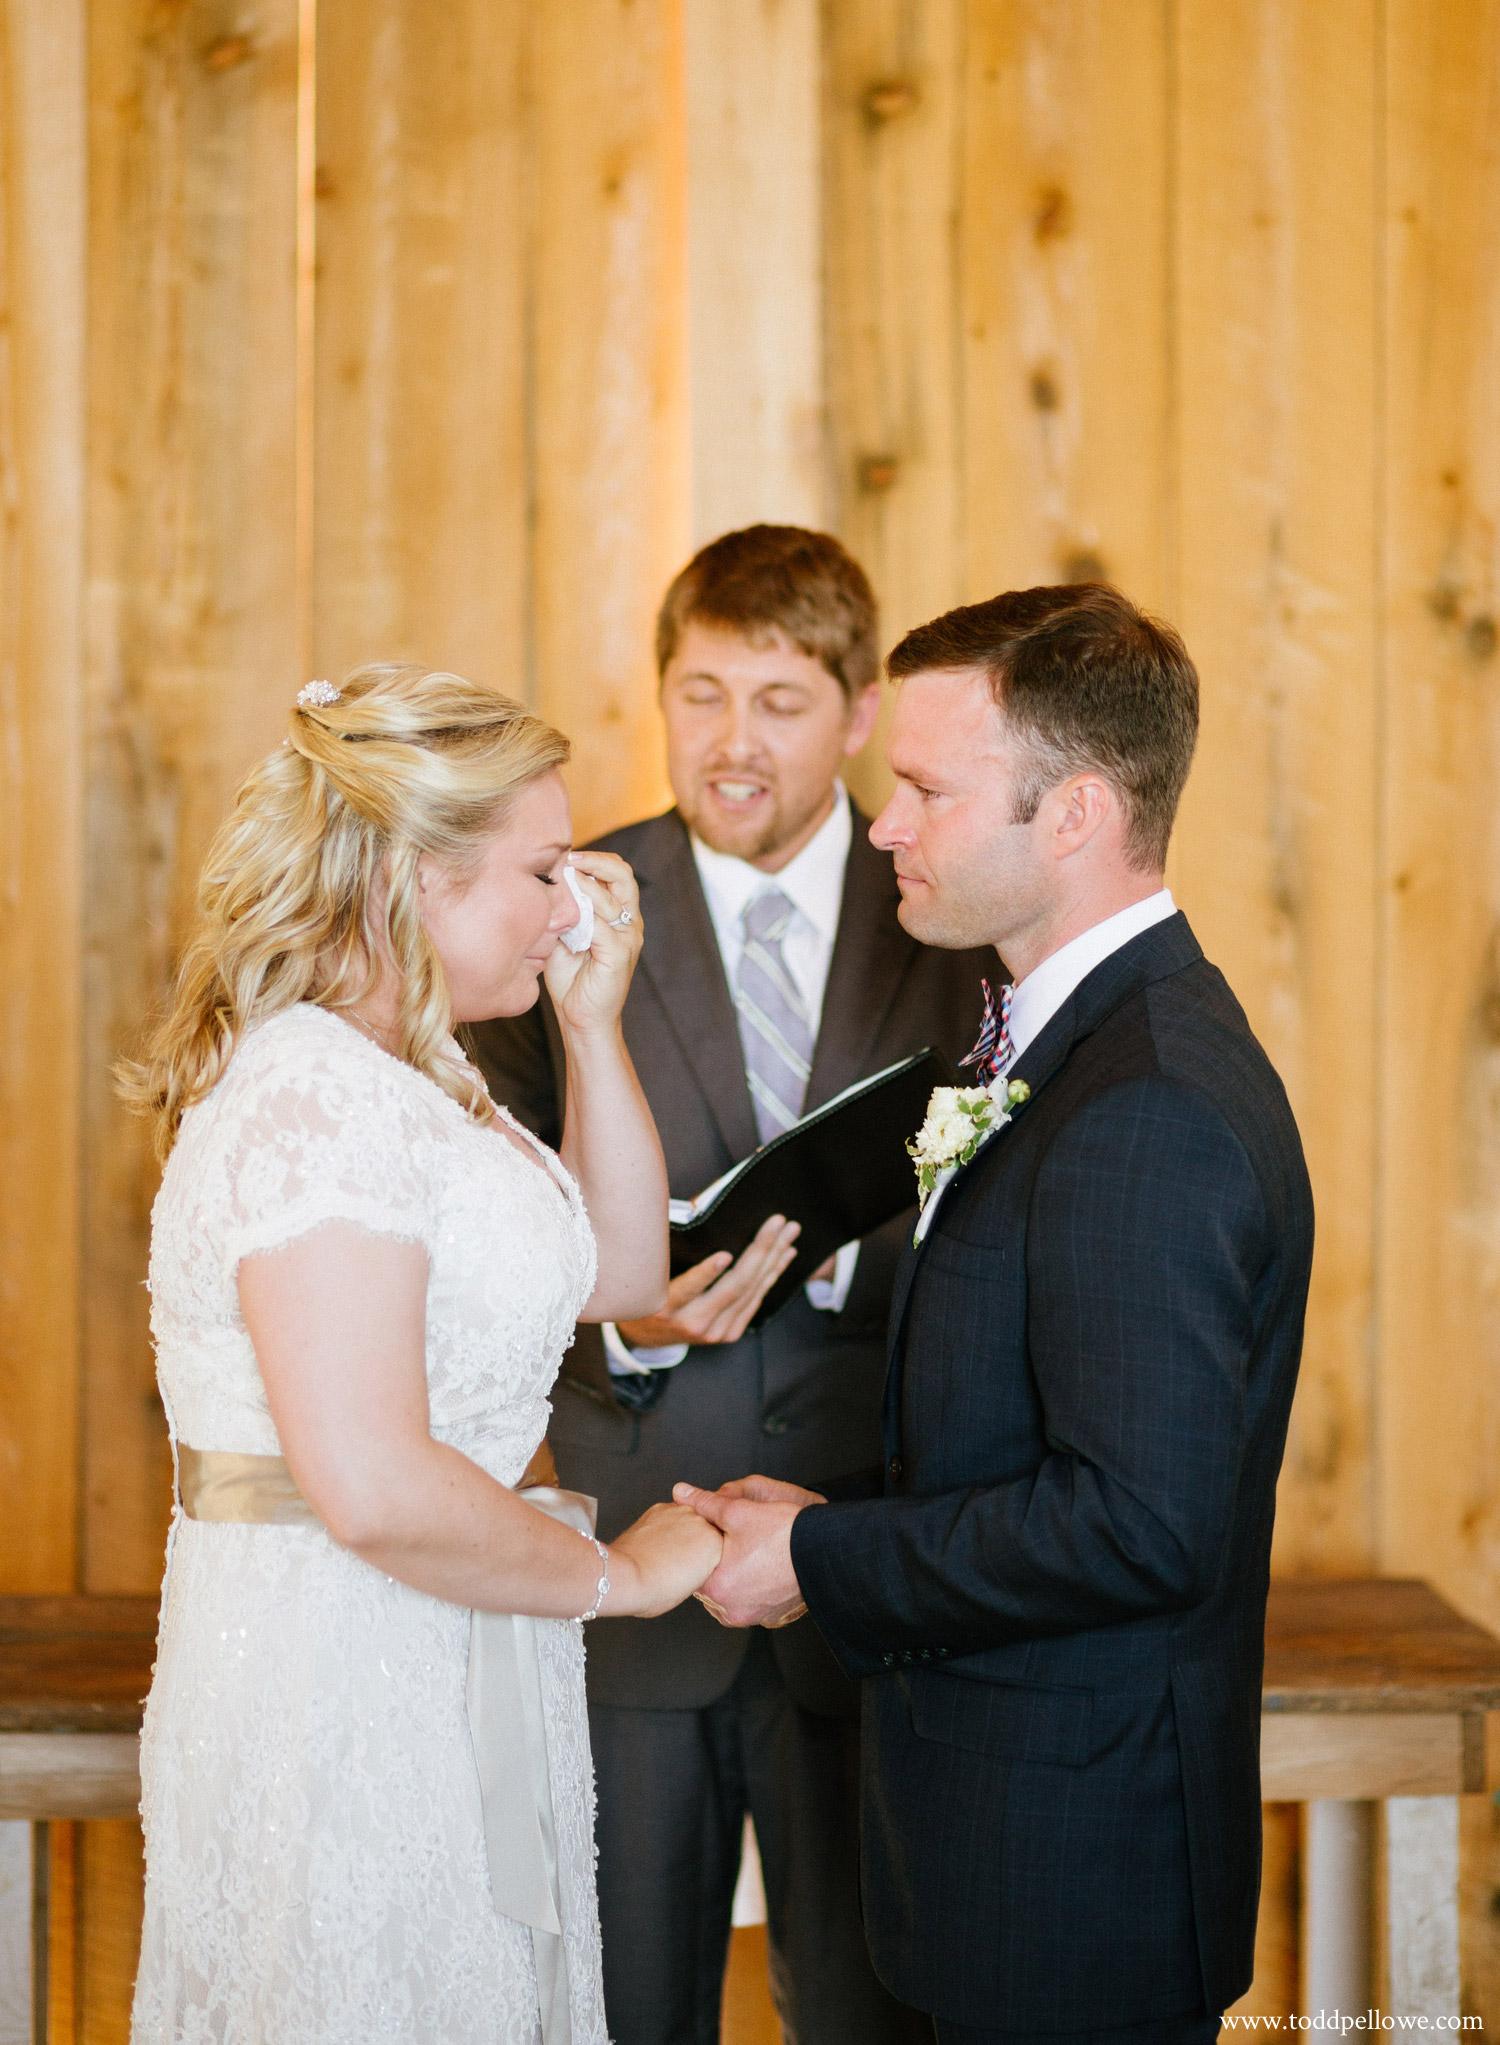 23-long-ridge-farm-wedding-shelbyville-387.jpg